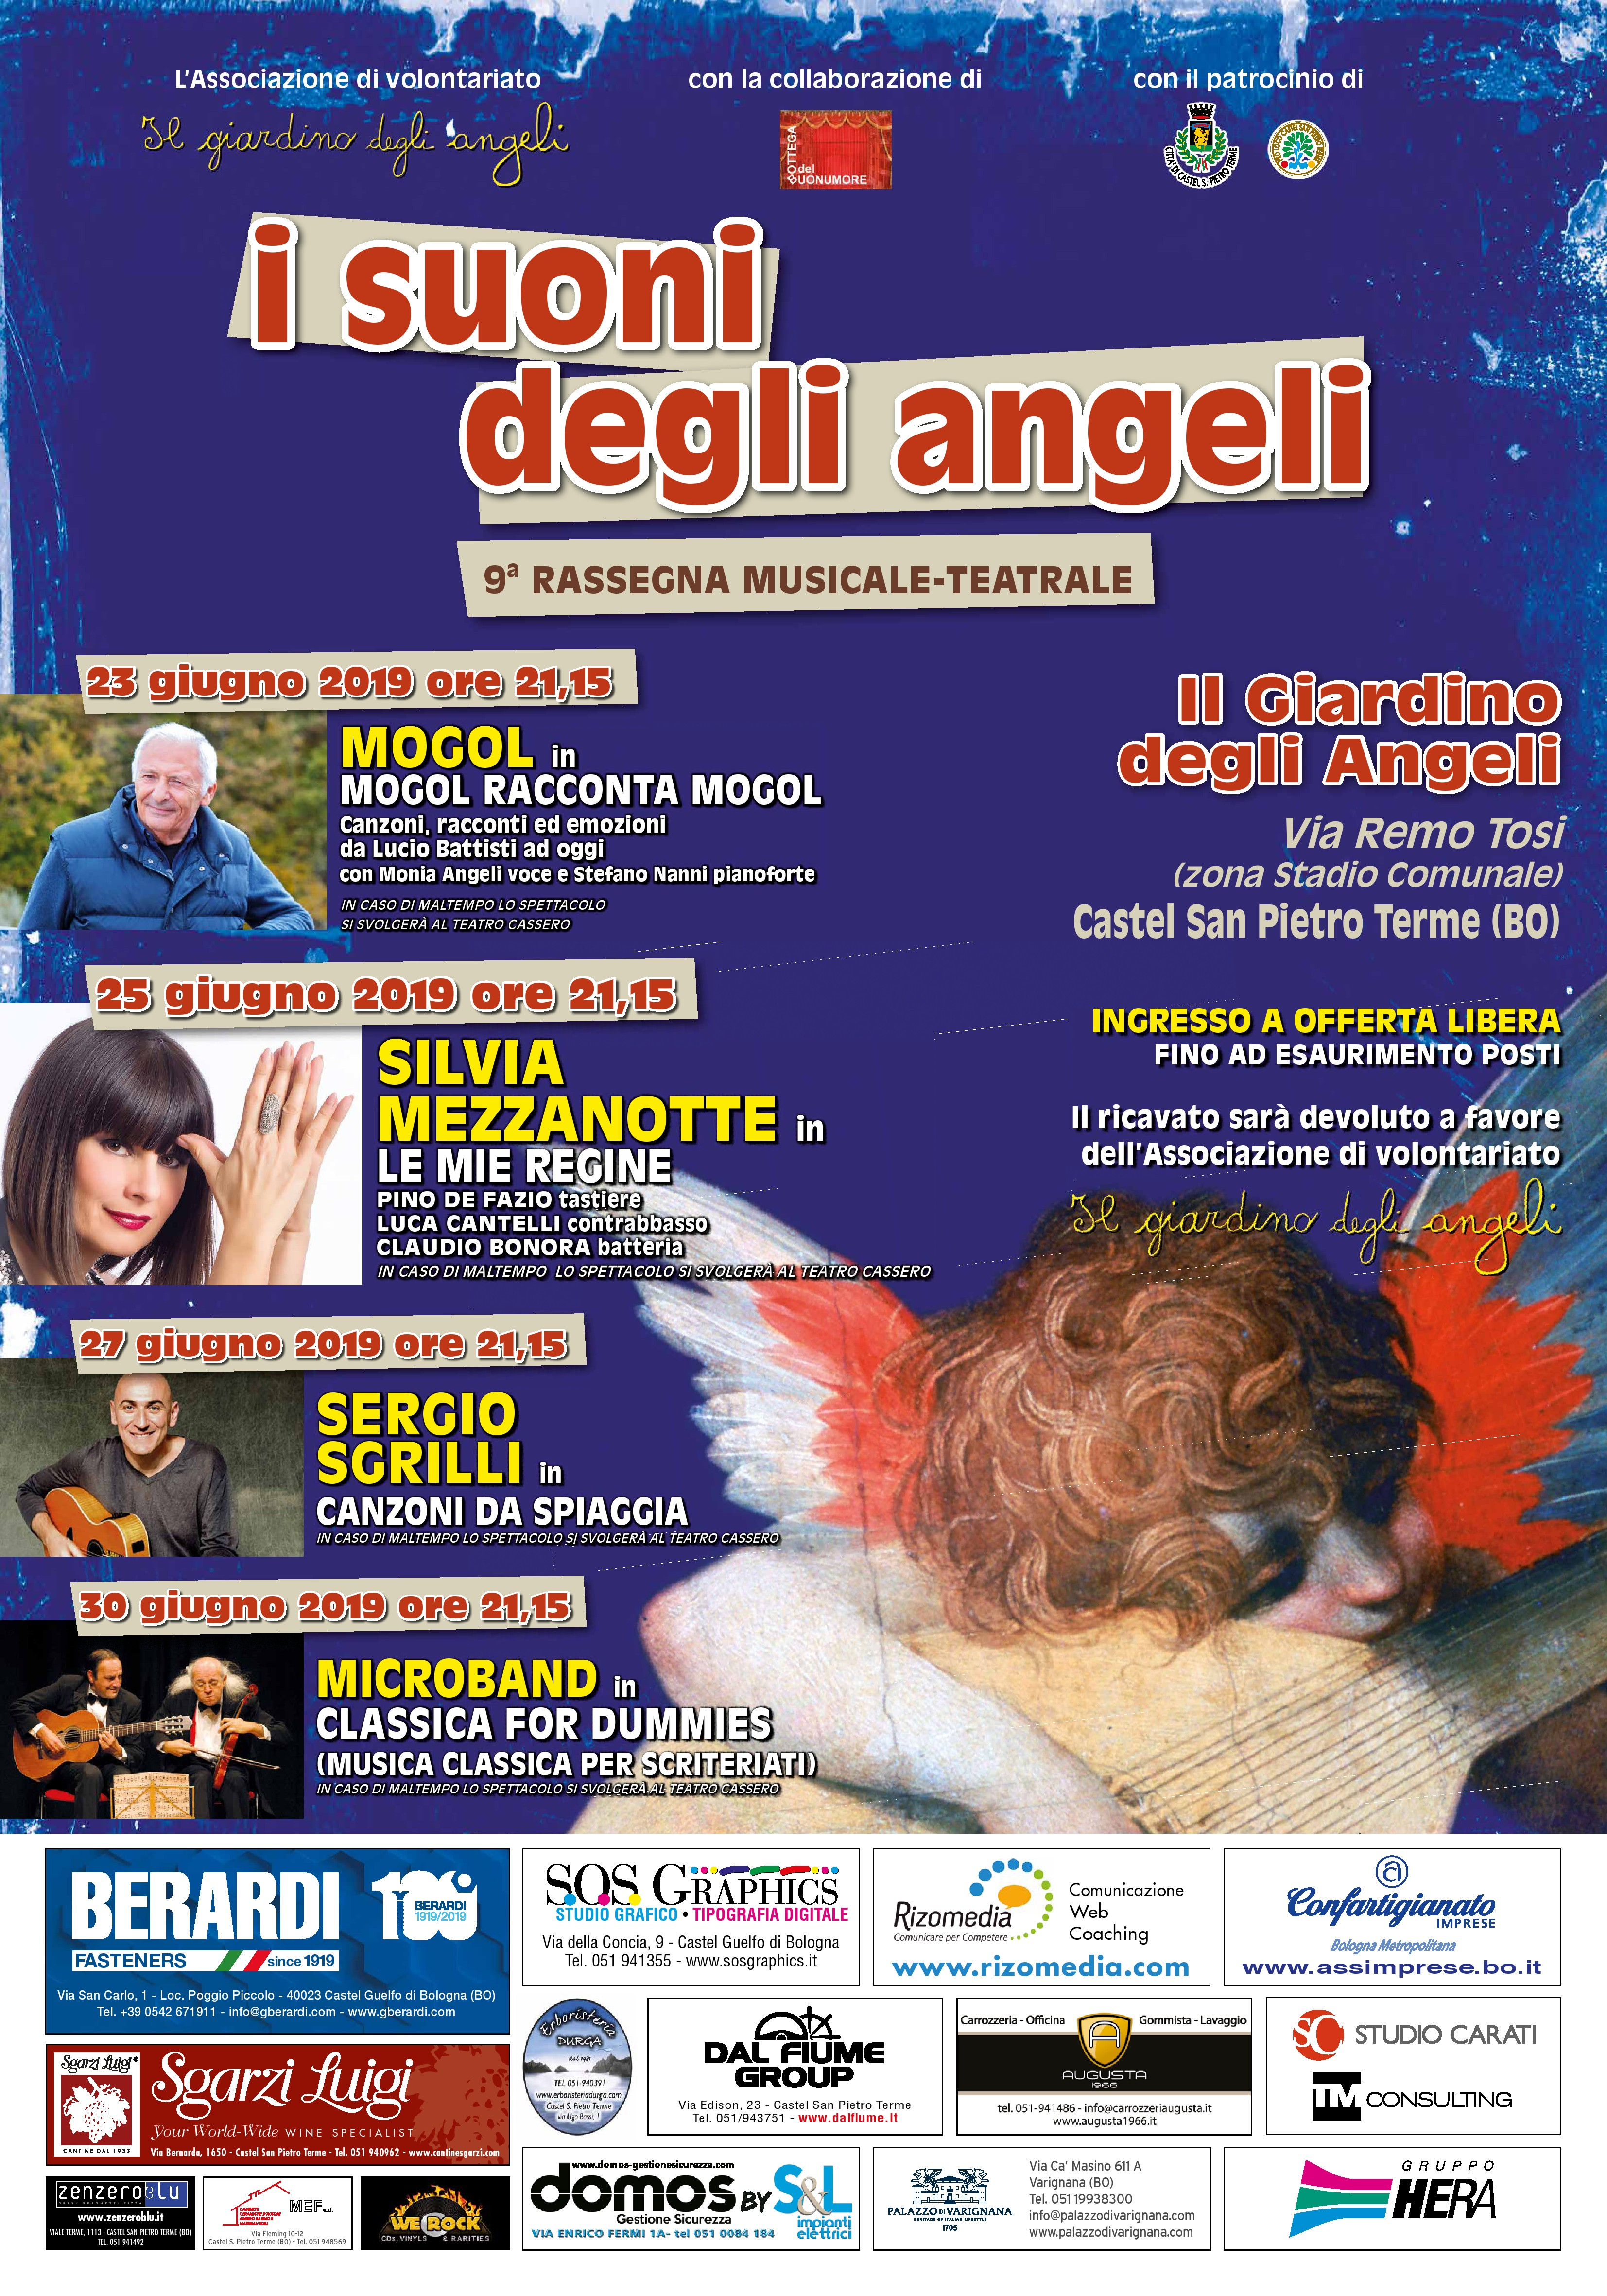 Mogol racconta Mogol feat Monia Angeli e Stefano Nanni